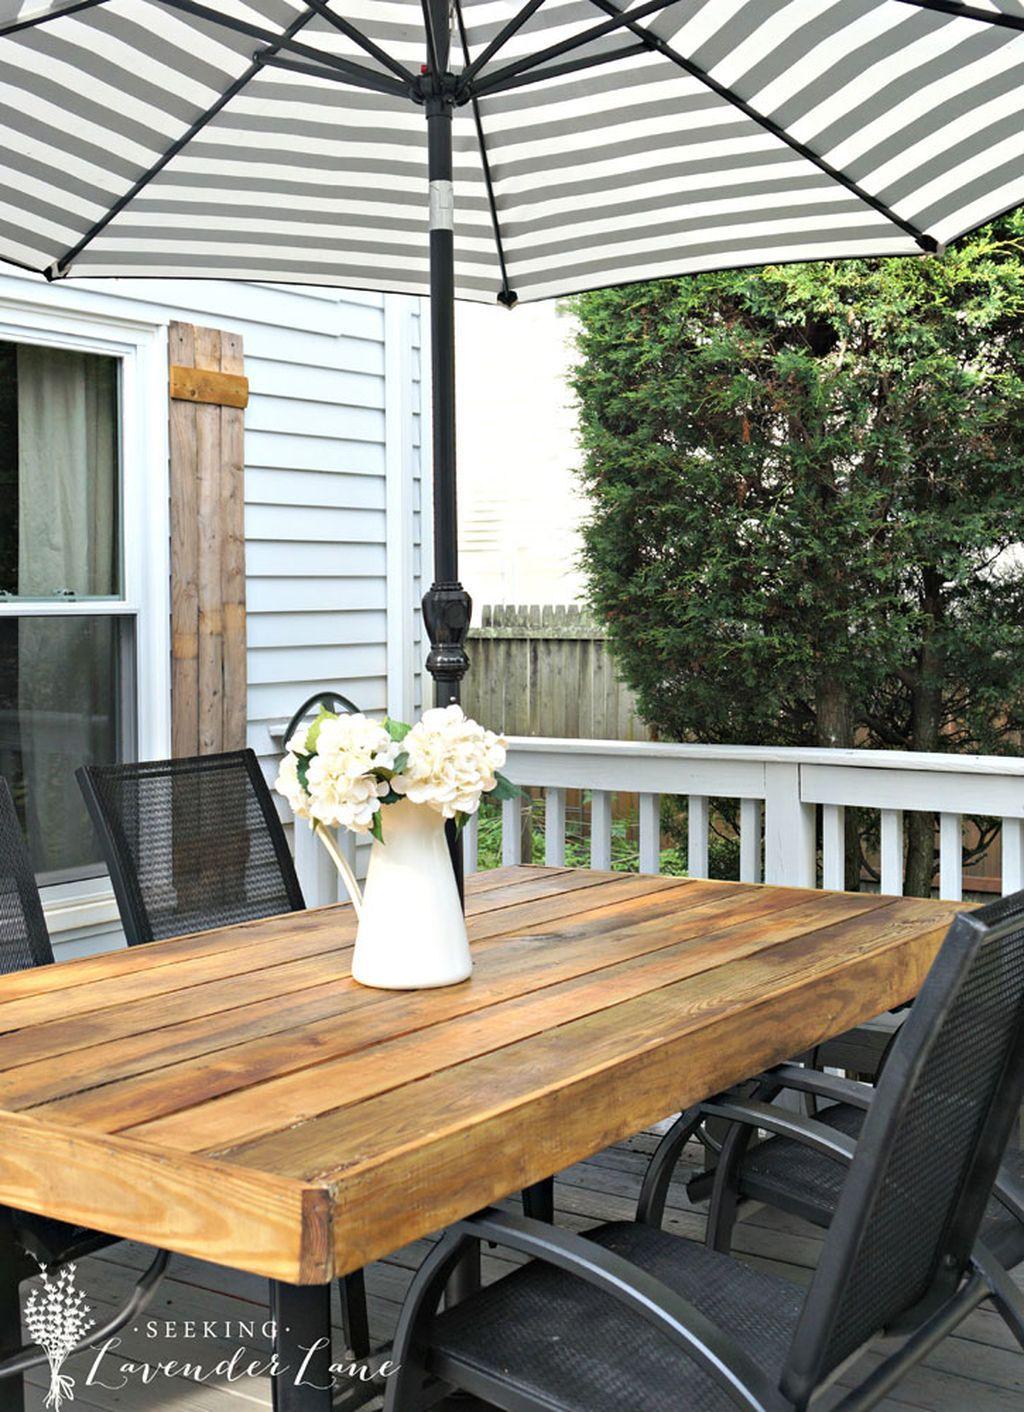 30 creative diy wood tables ideas for outdoor